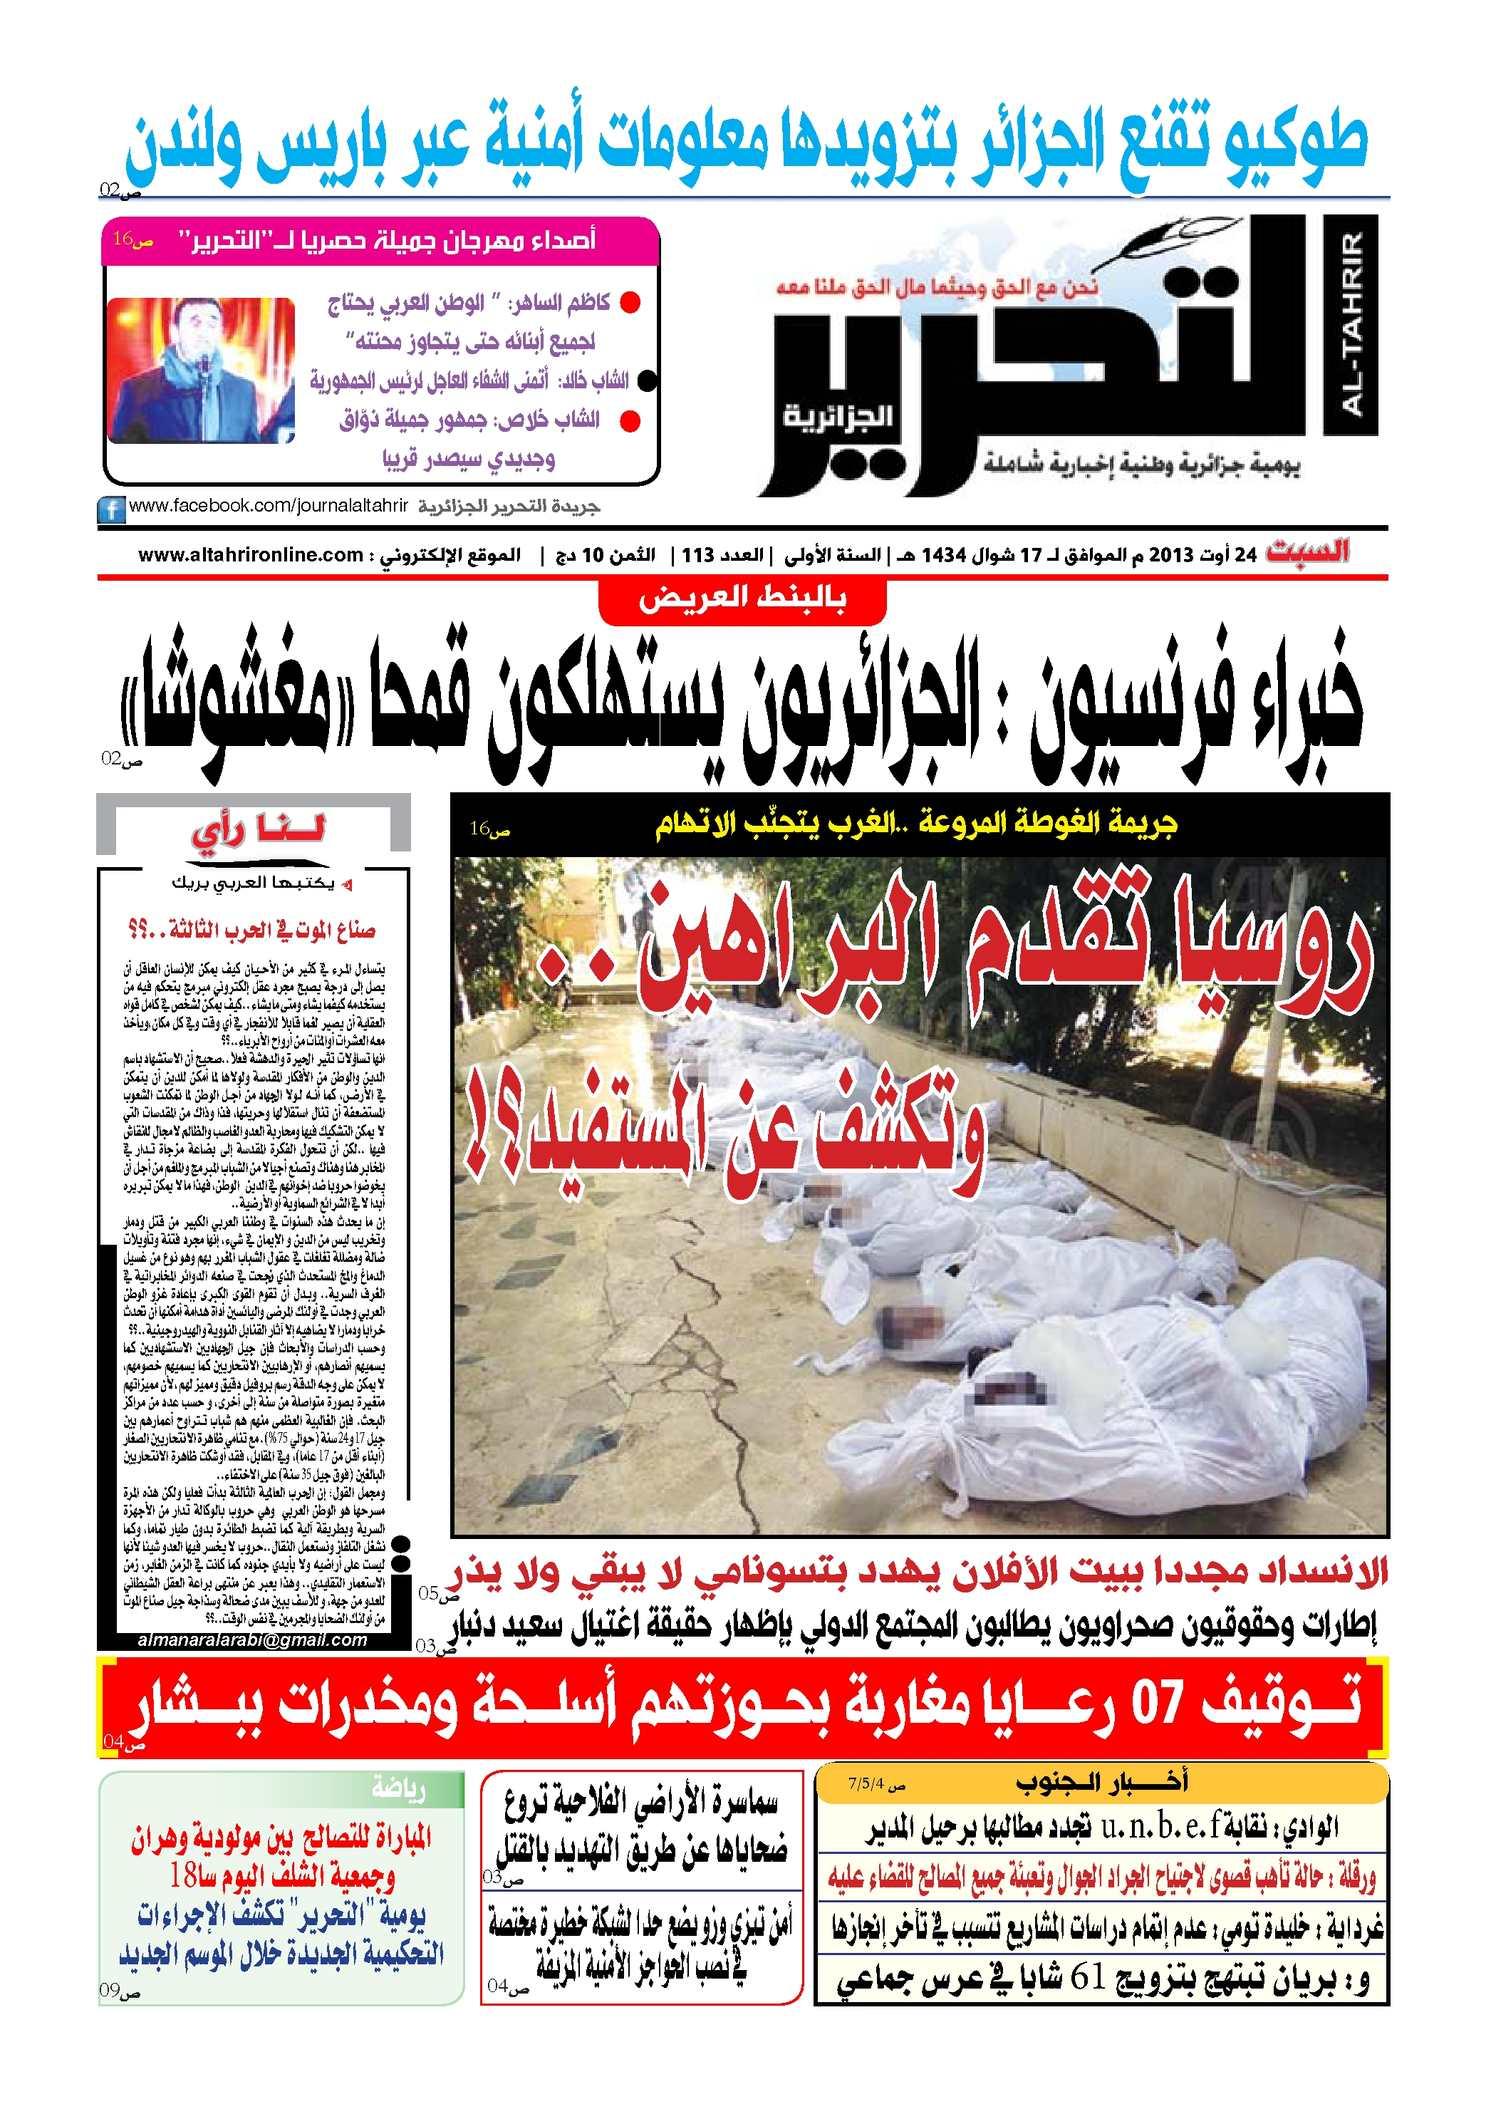 dd8ee944a Calaméo - جريدة التحرير الجزائرية العدد 113